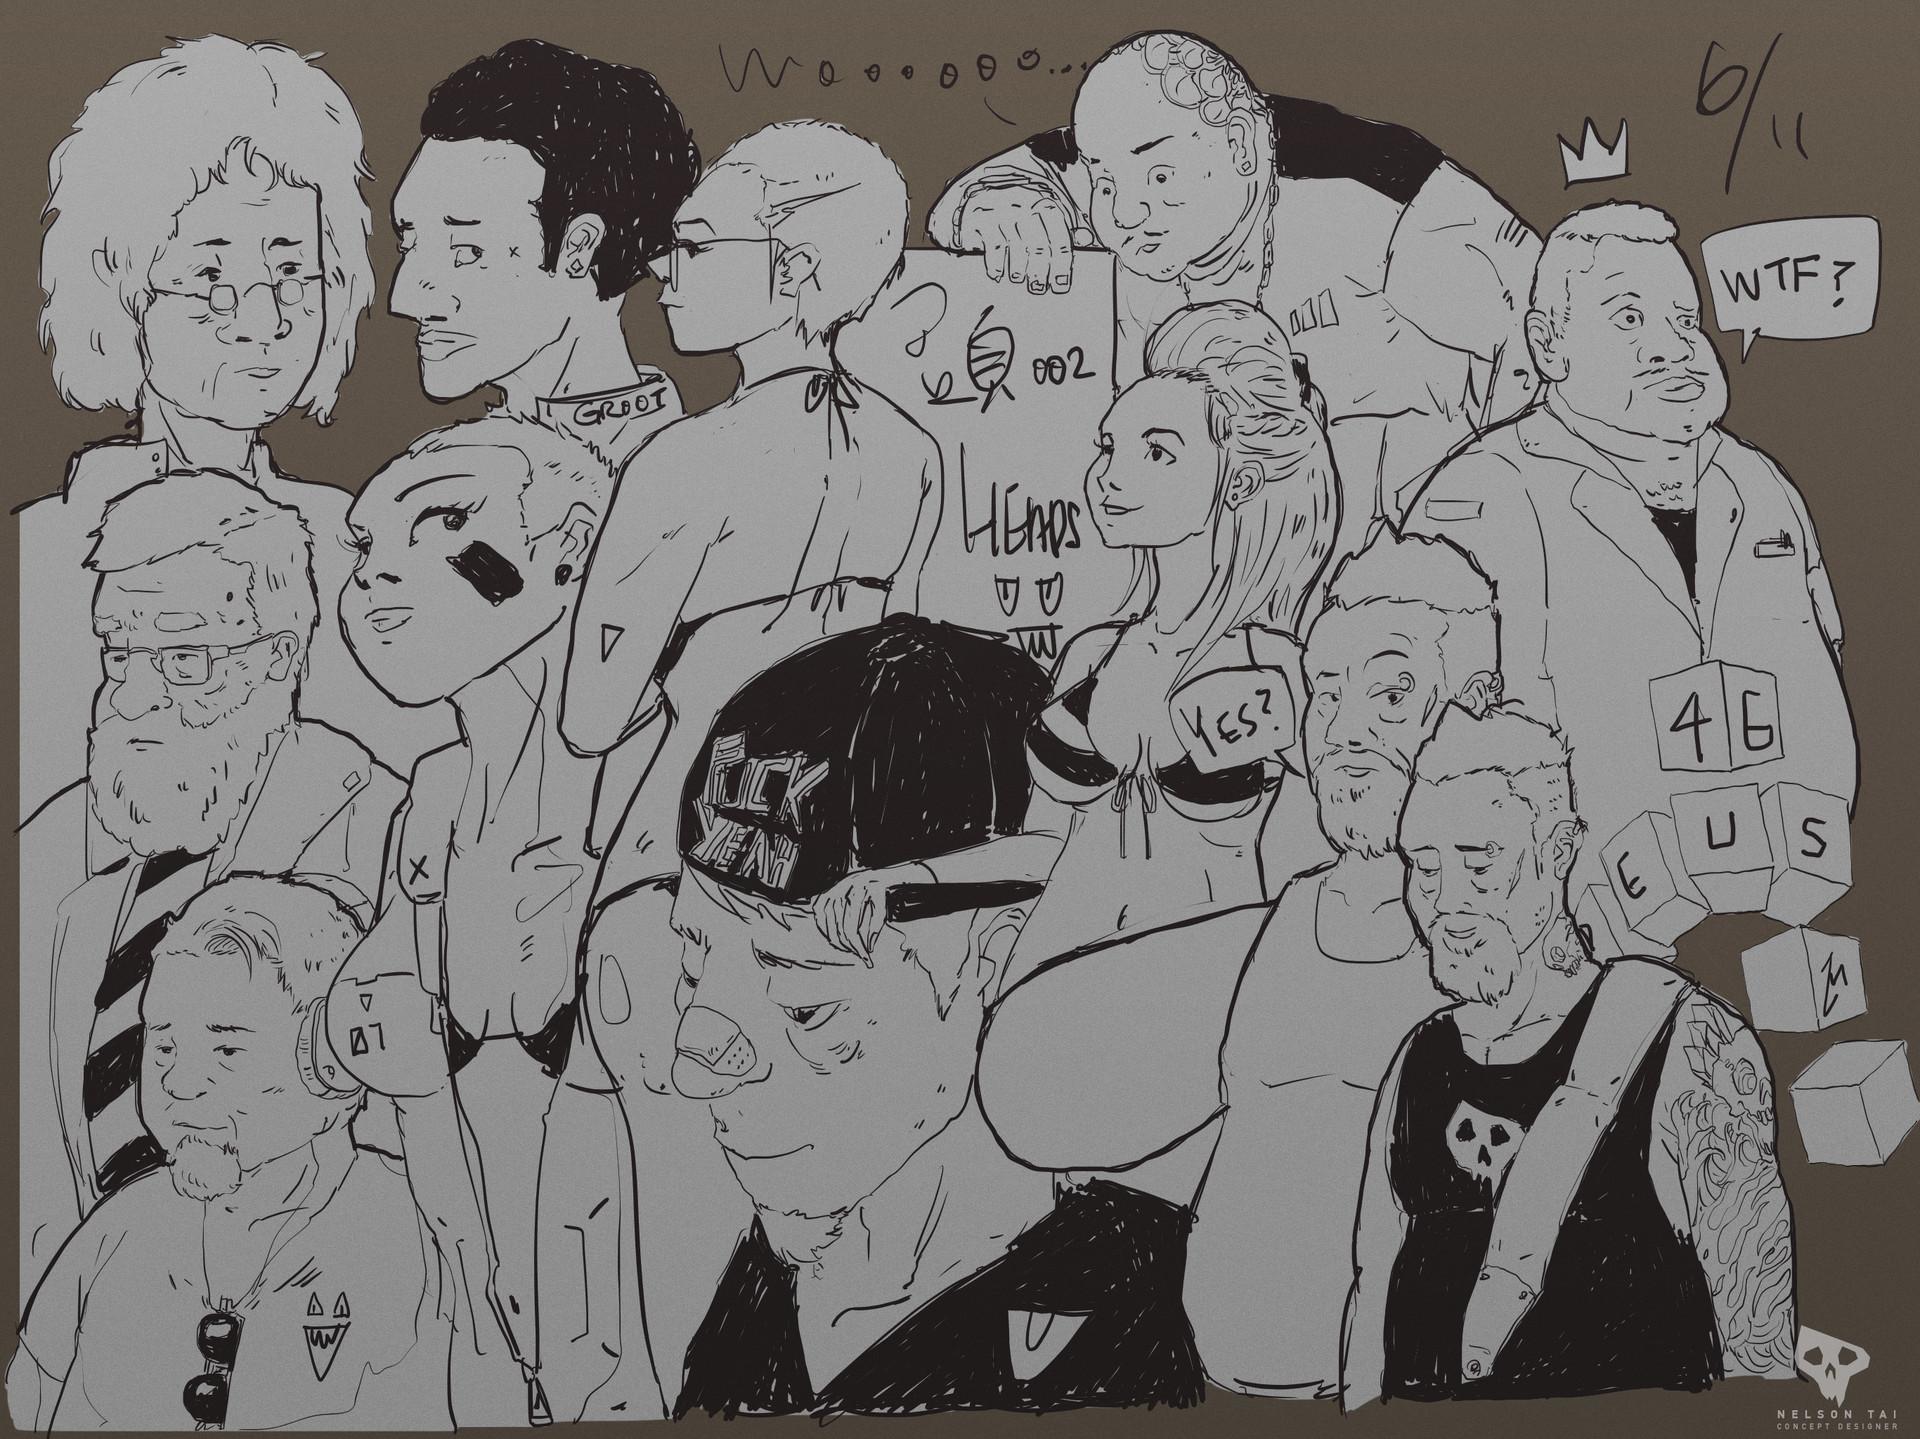 Nelson tai 20180611 sketch